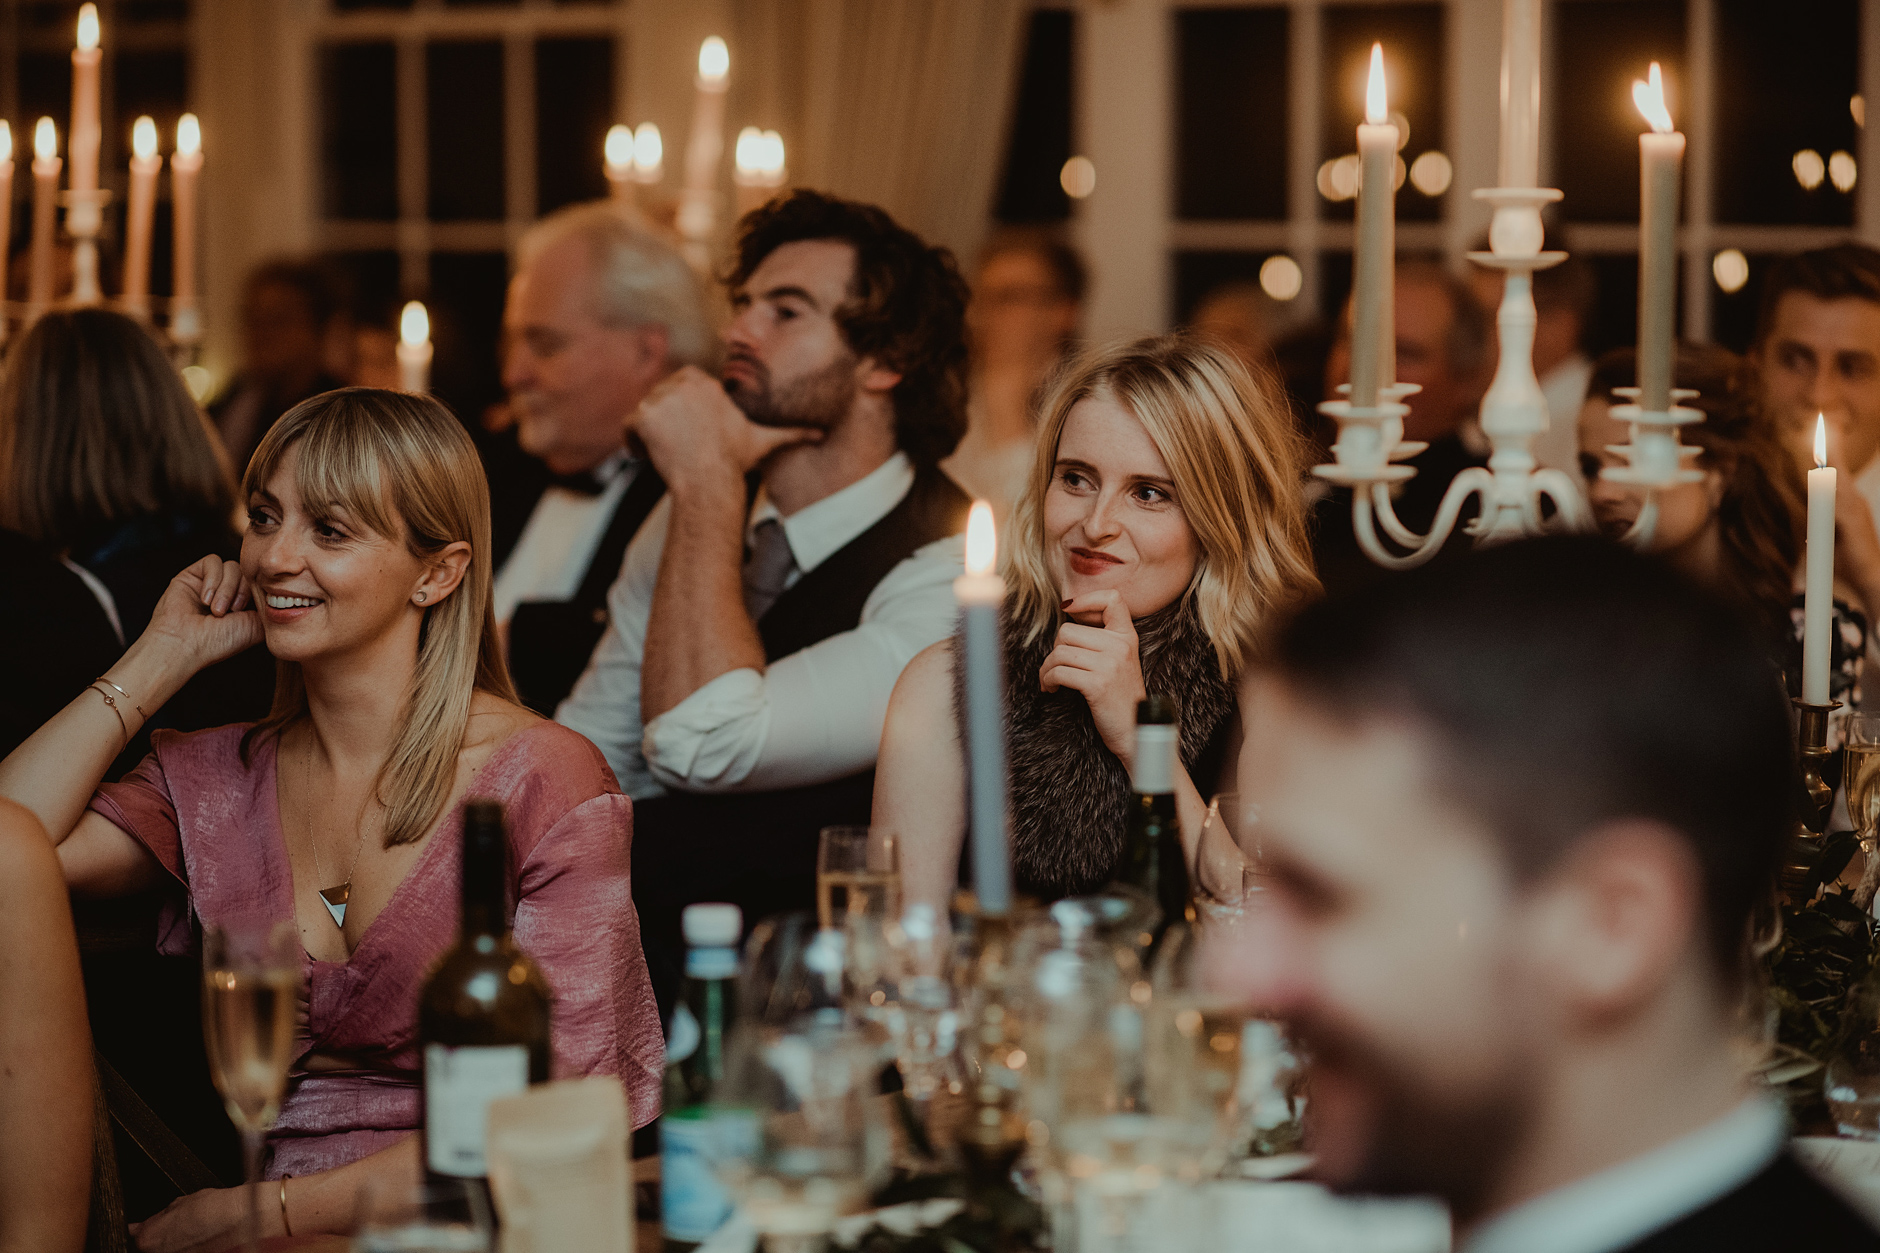 Glentruim-Wedding-Nikki-Leadbetter-Photography-271.jpg